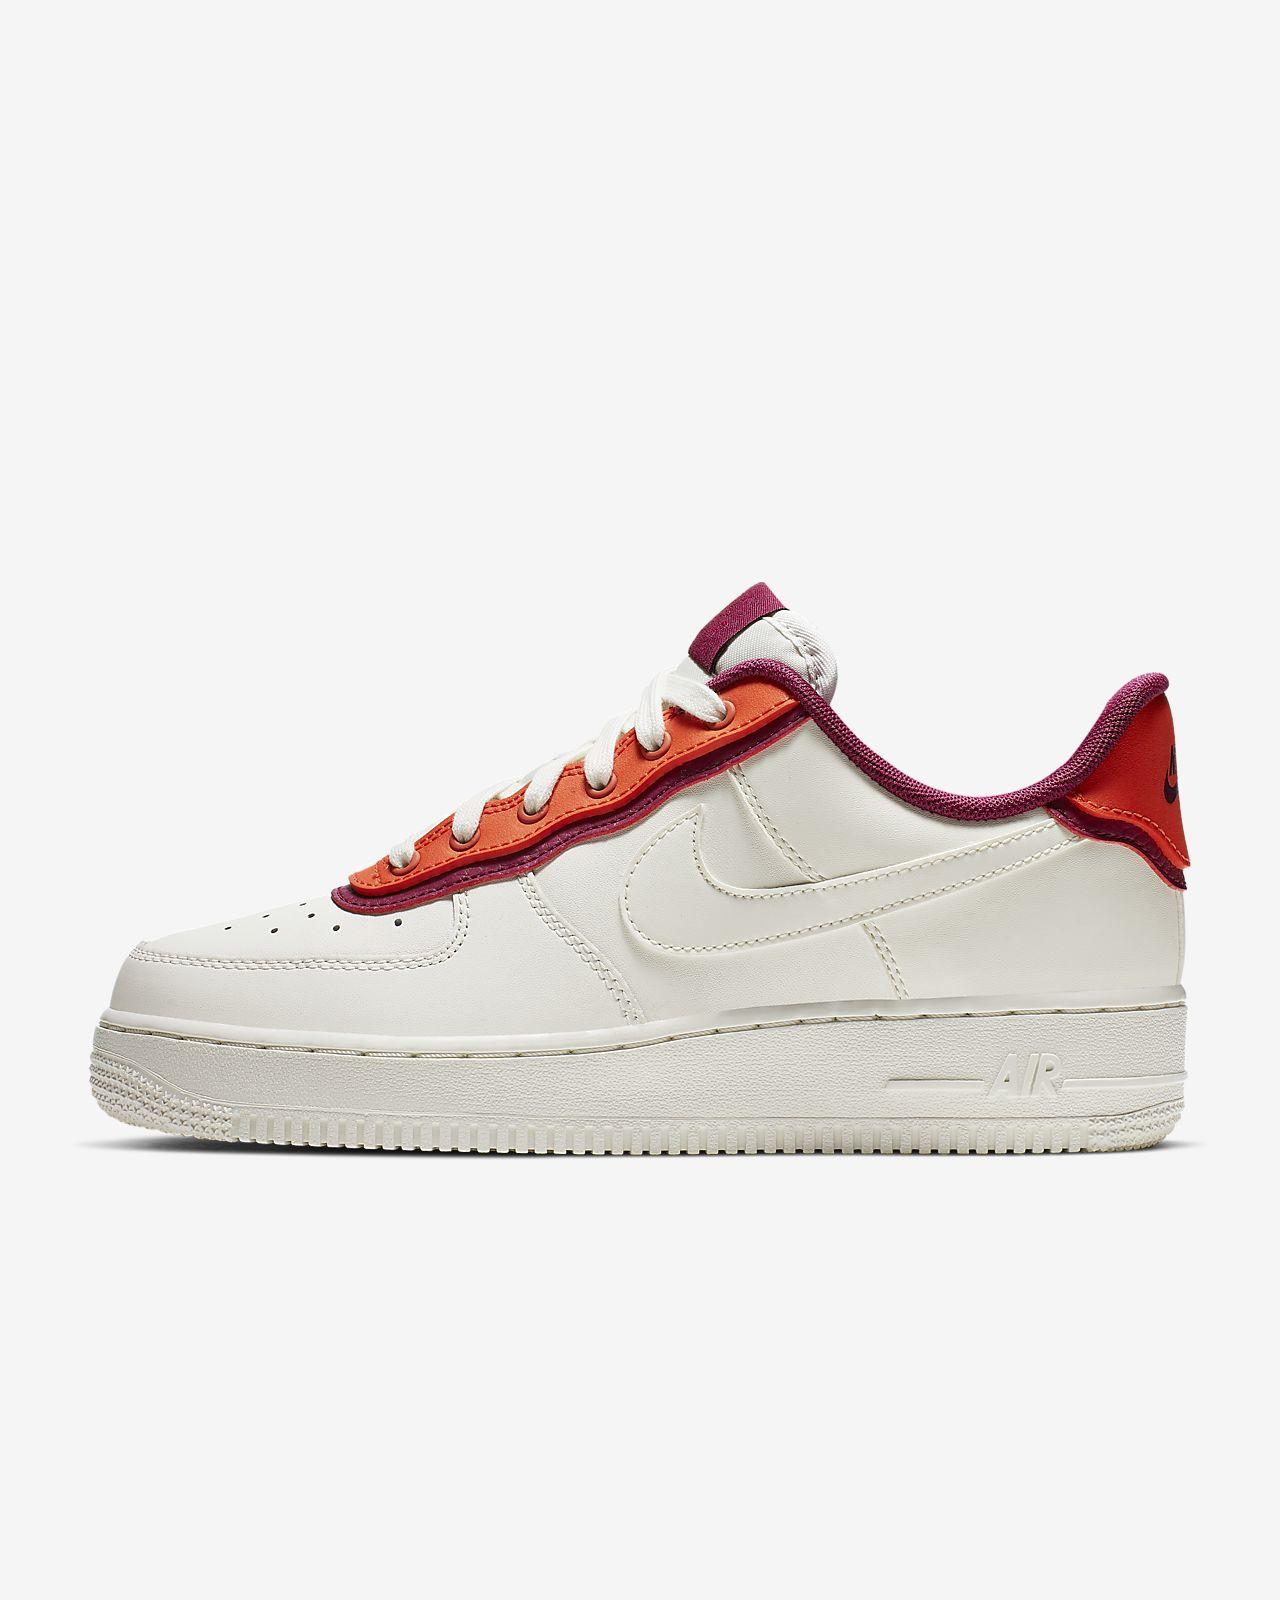 faa44ef3bda Chaussure Nike Air Force 1  07 SE pour Femme. Nike.com CA